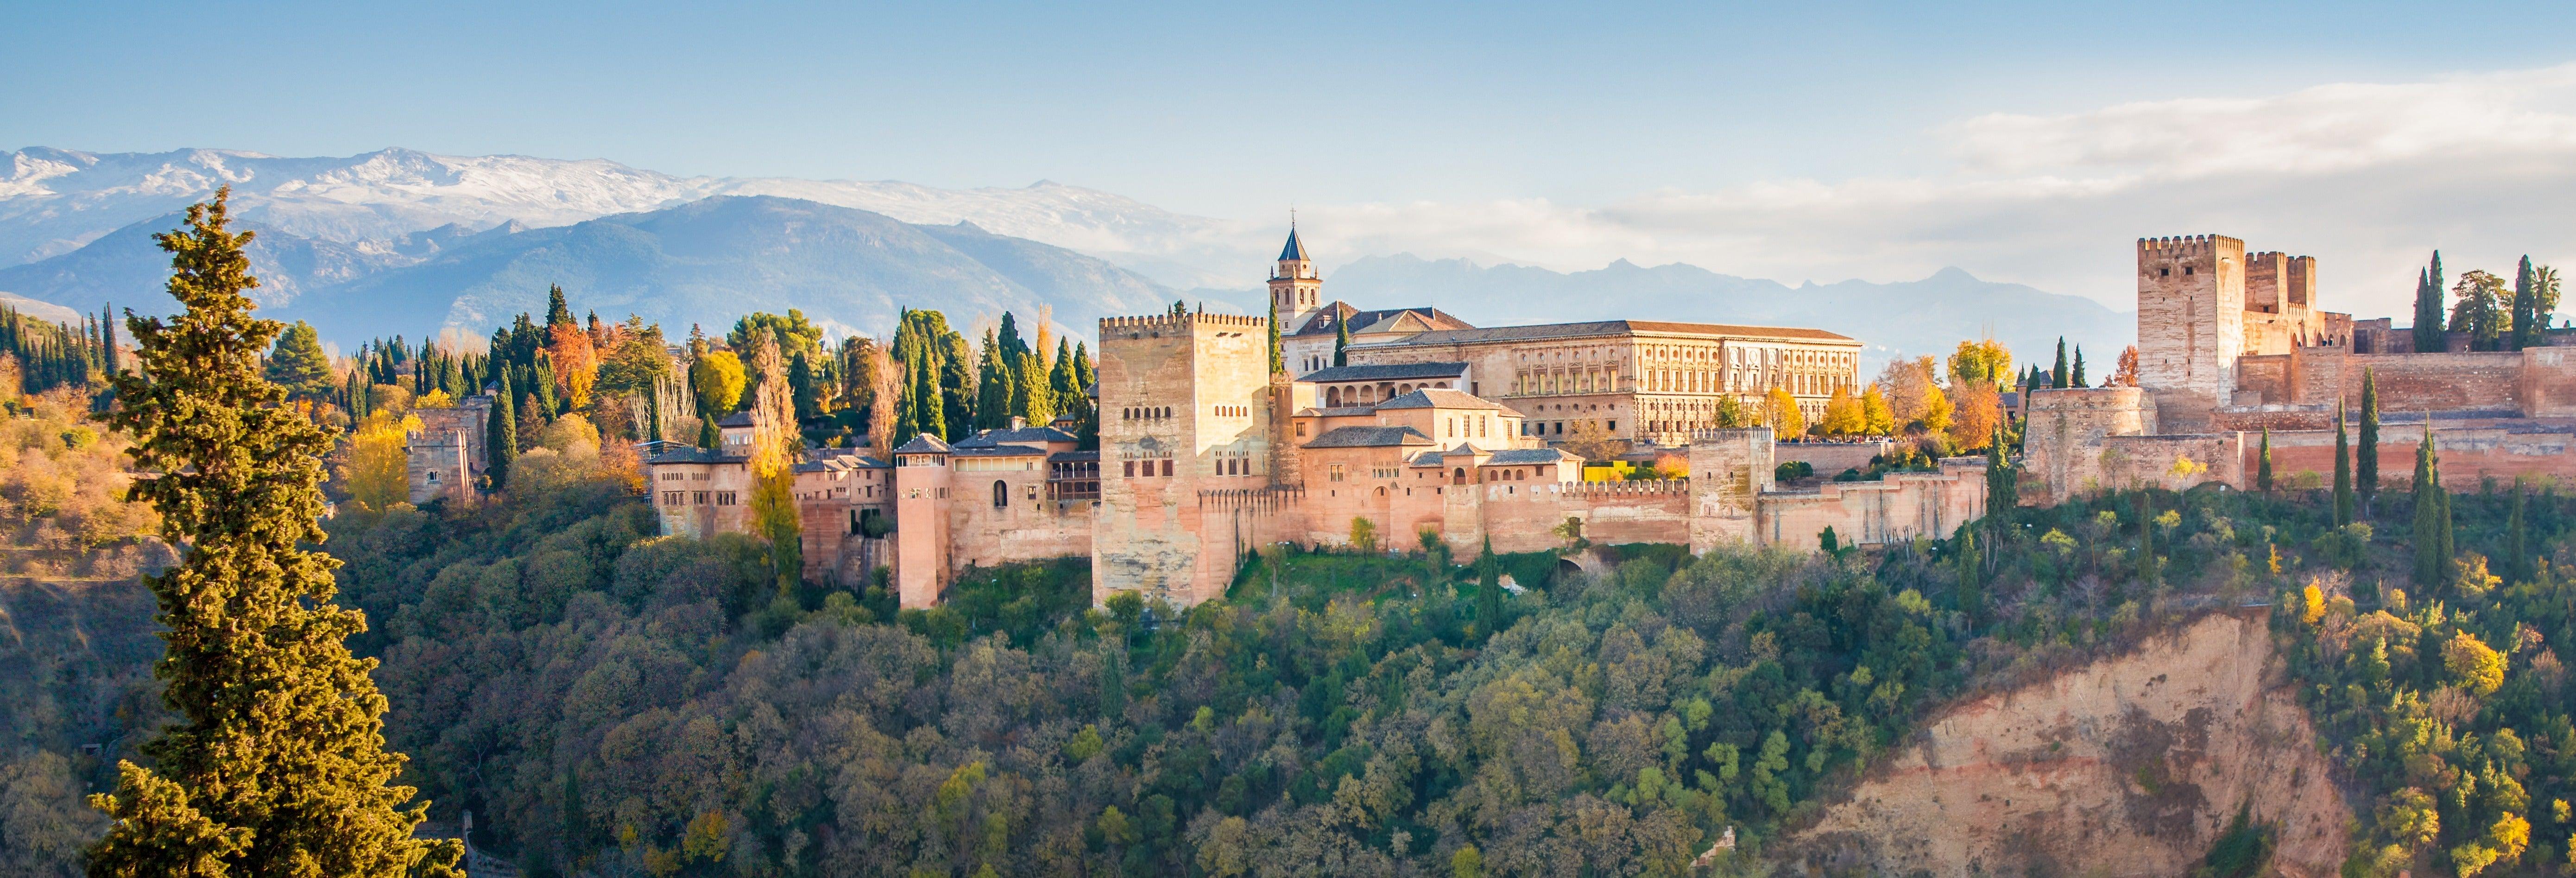 Alhambra & Generalife Ticket